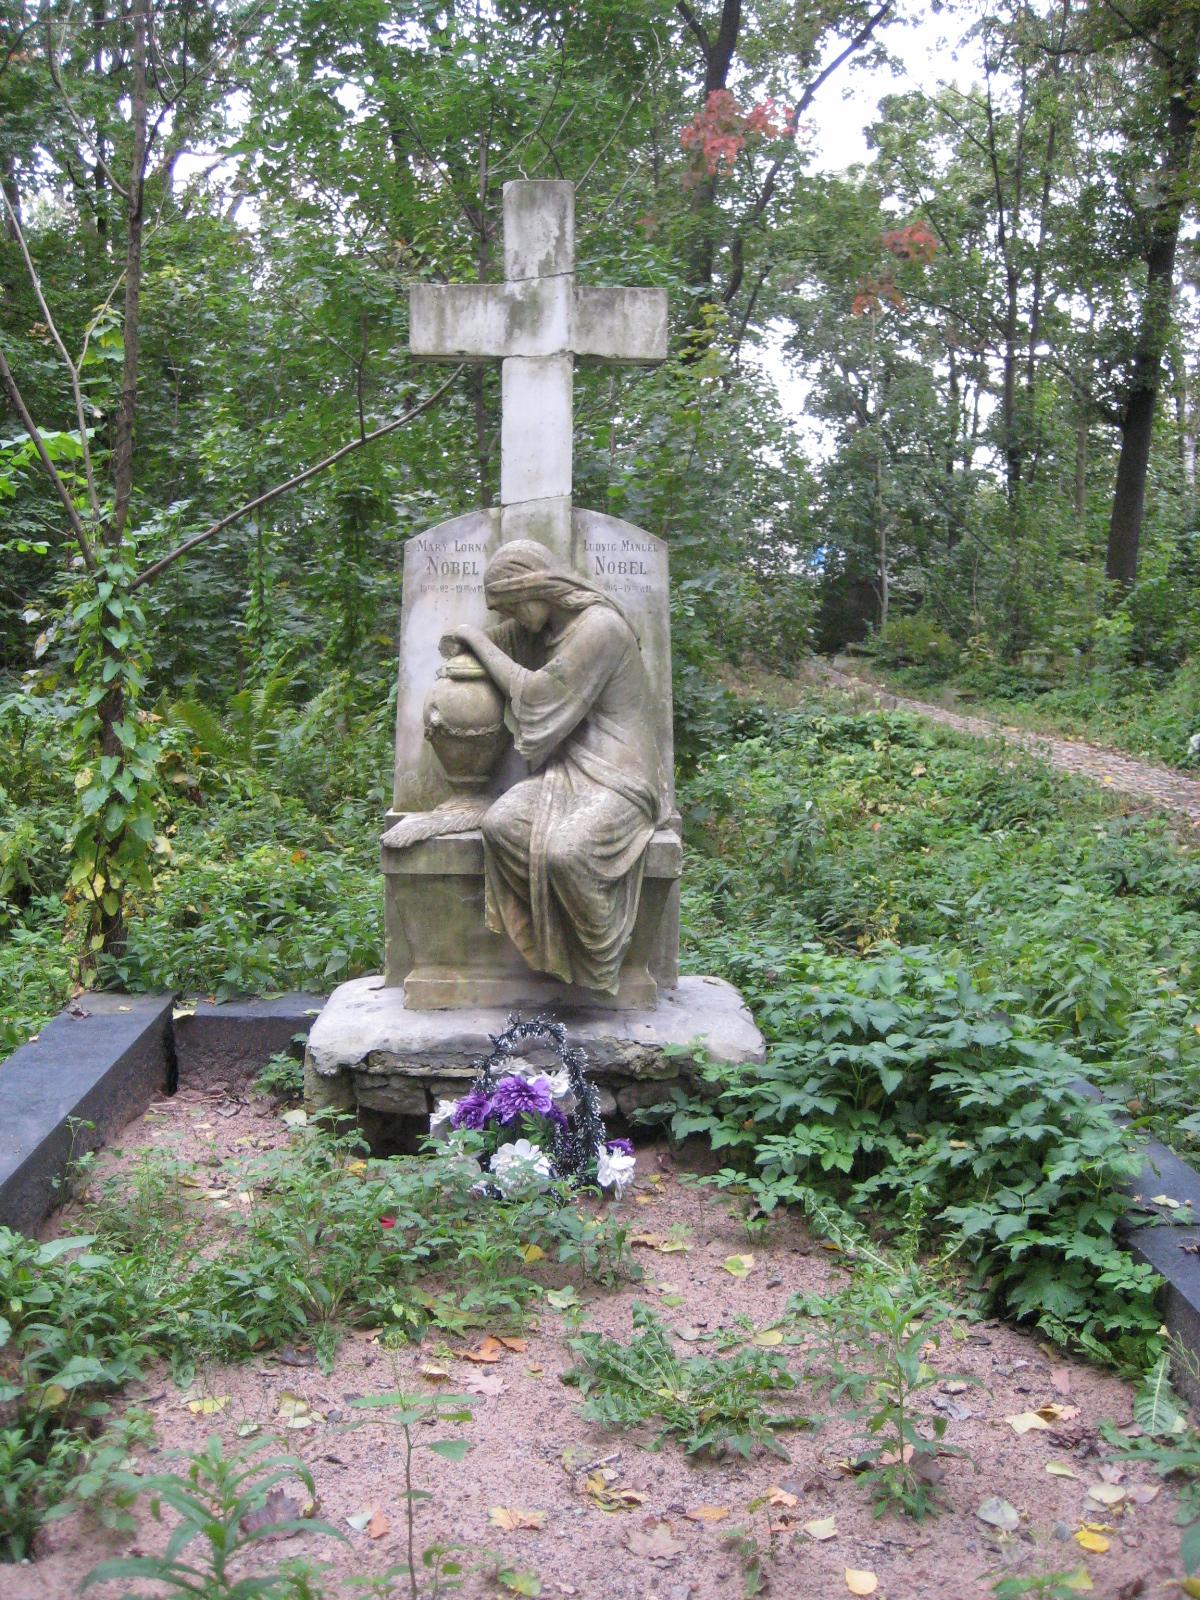 At Smolenskoe Cemetery